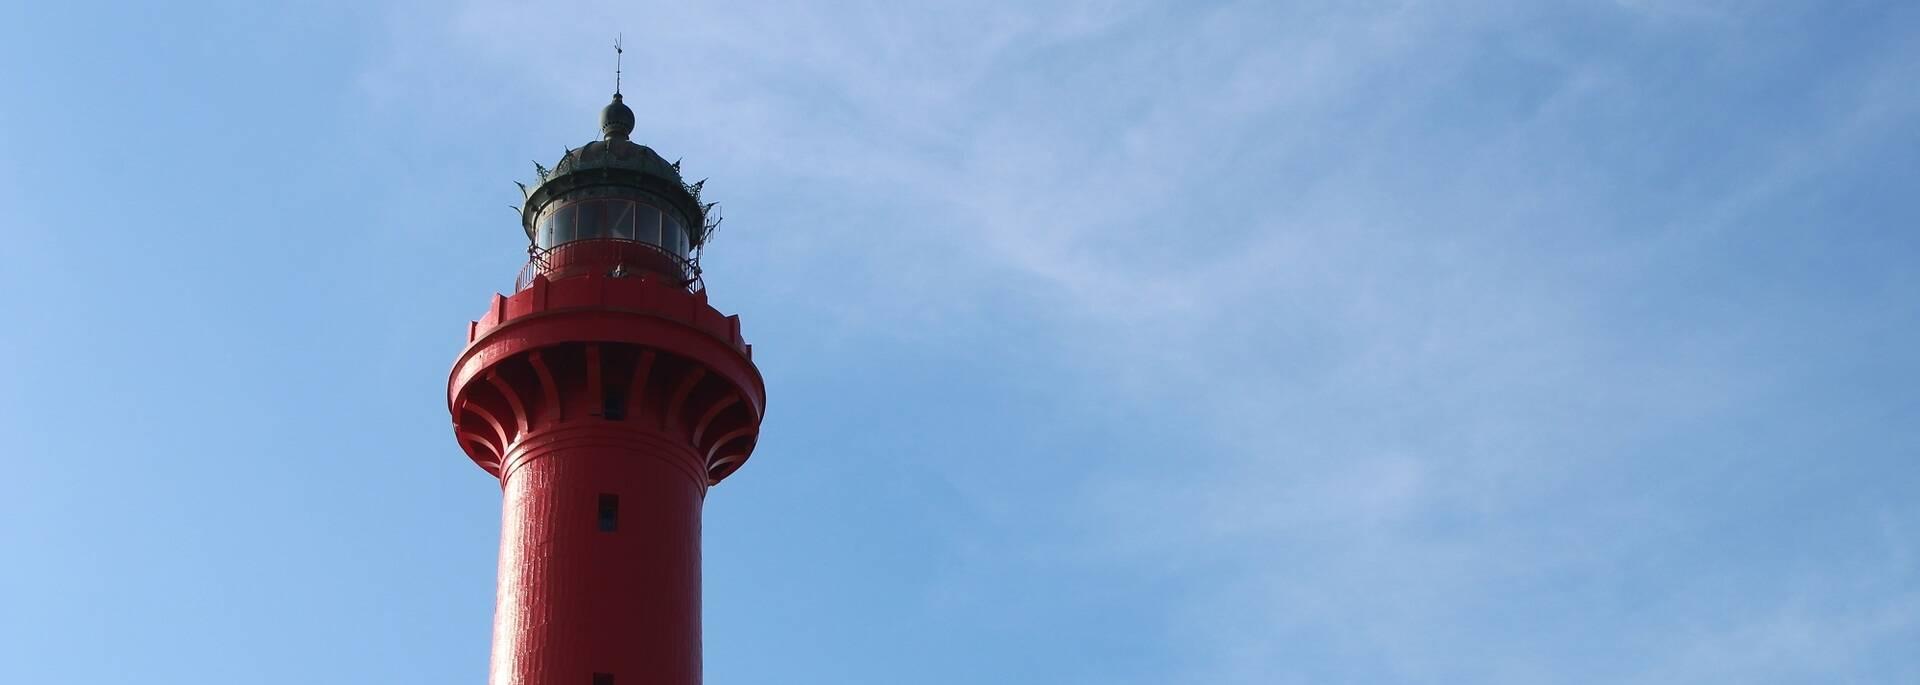 Le phare de la Coubre - ©P.Migaud / FDHPA 17